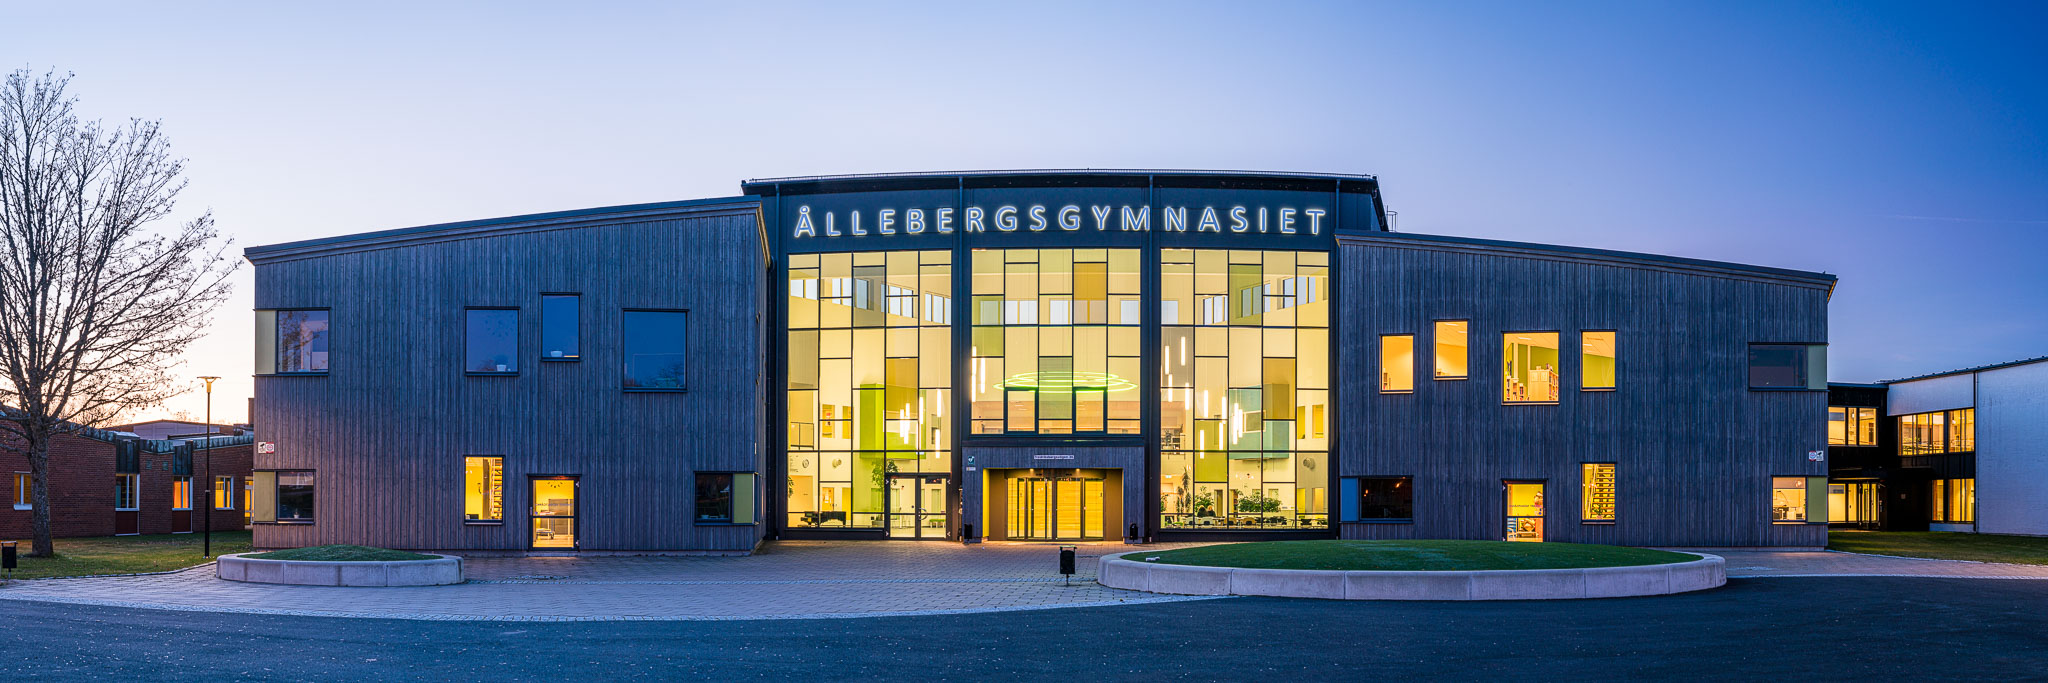 architect, photographer, arkitektfotograf, arkitektur, fotografi, vbk, vindangen, falkoping, goteborg, sweden